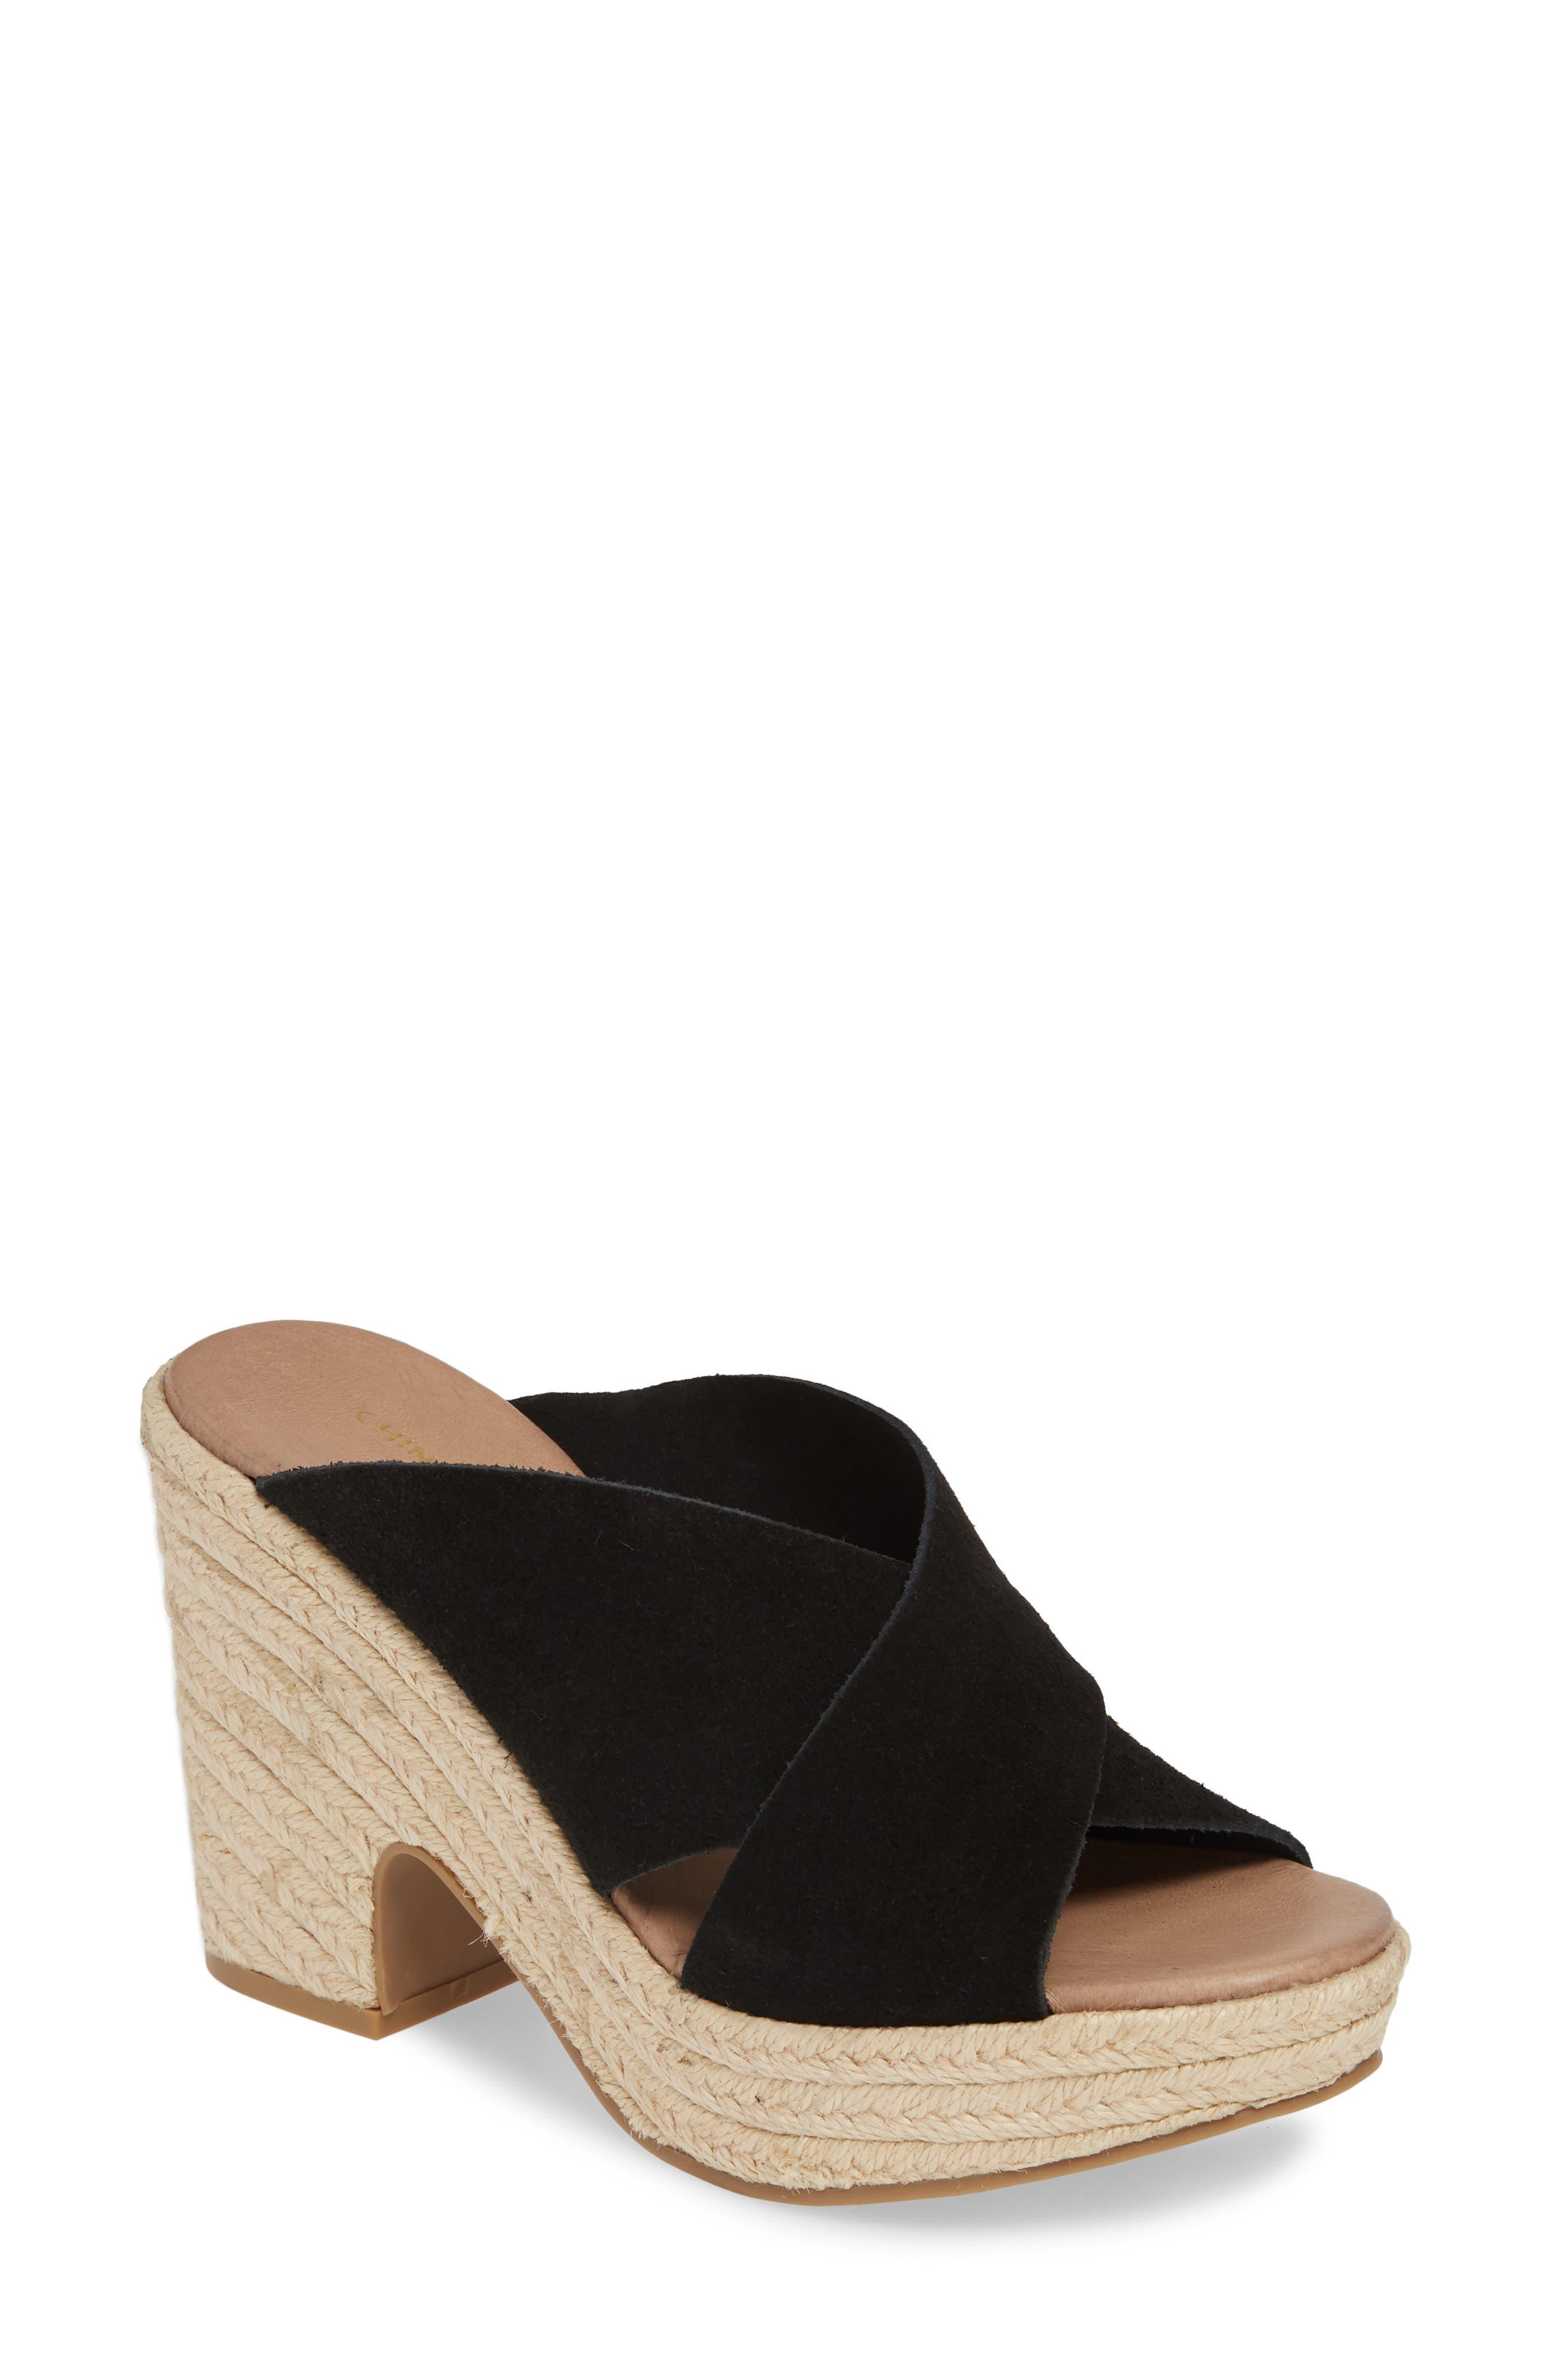 CHINESE LAUNDRY, Quay Platform Sandal, Main thumbnail 1, color, BLACK SUEDE